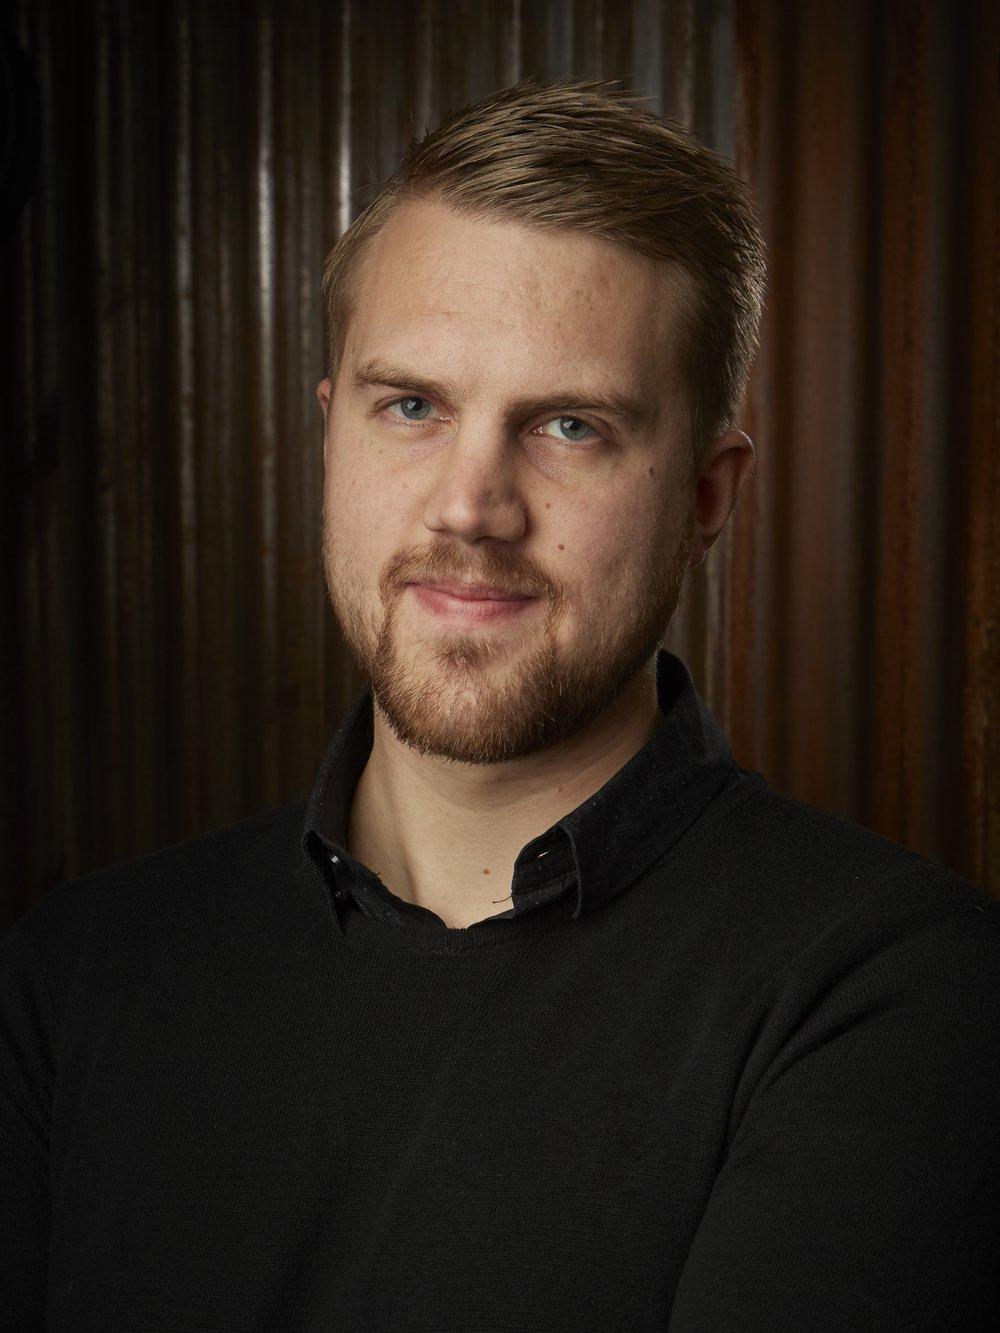 Fredrik Cronberg